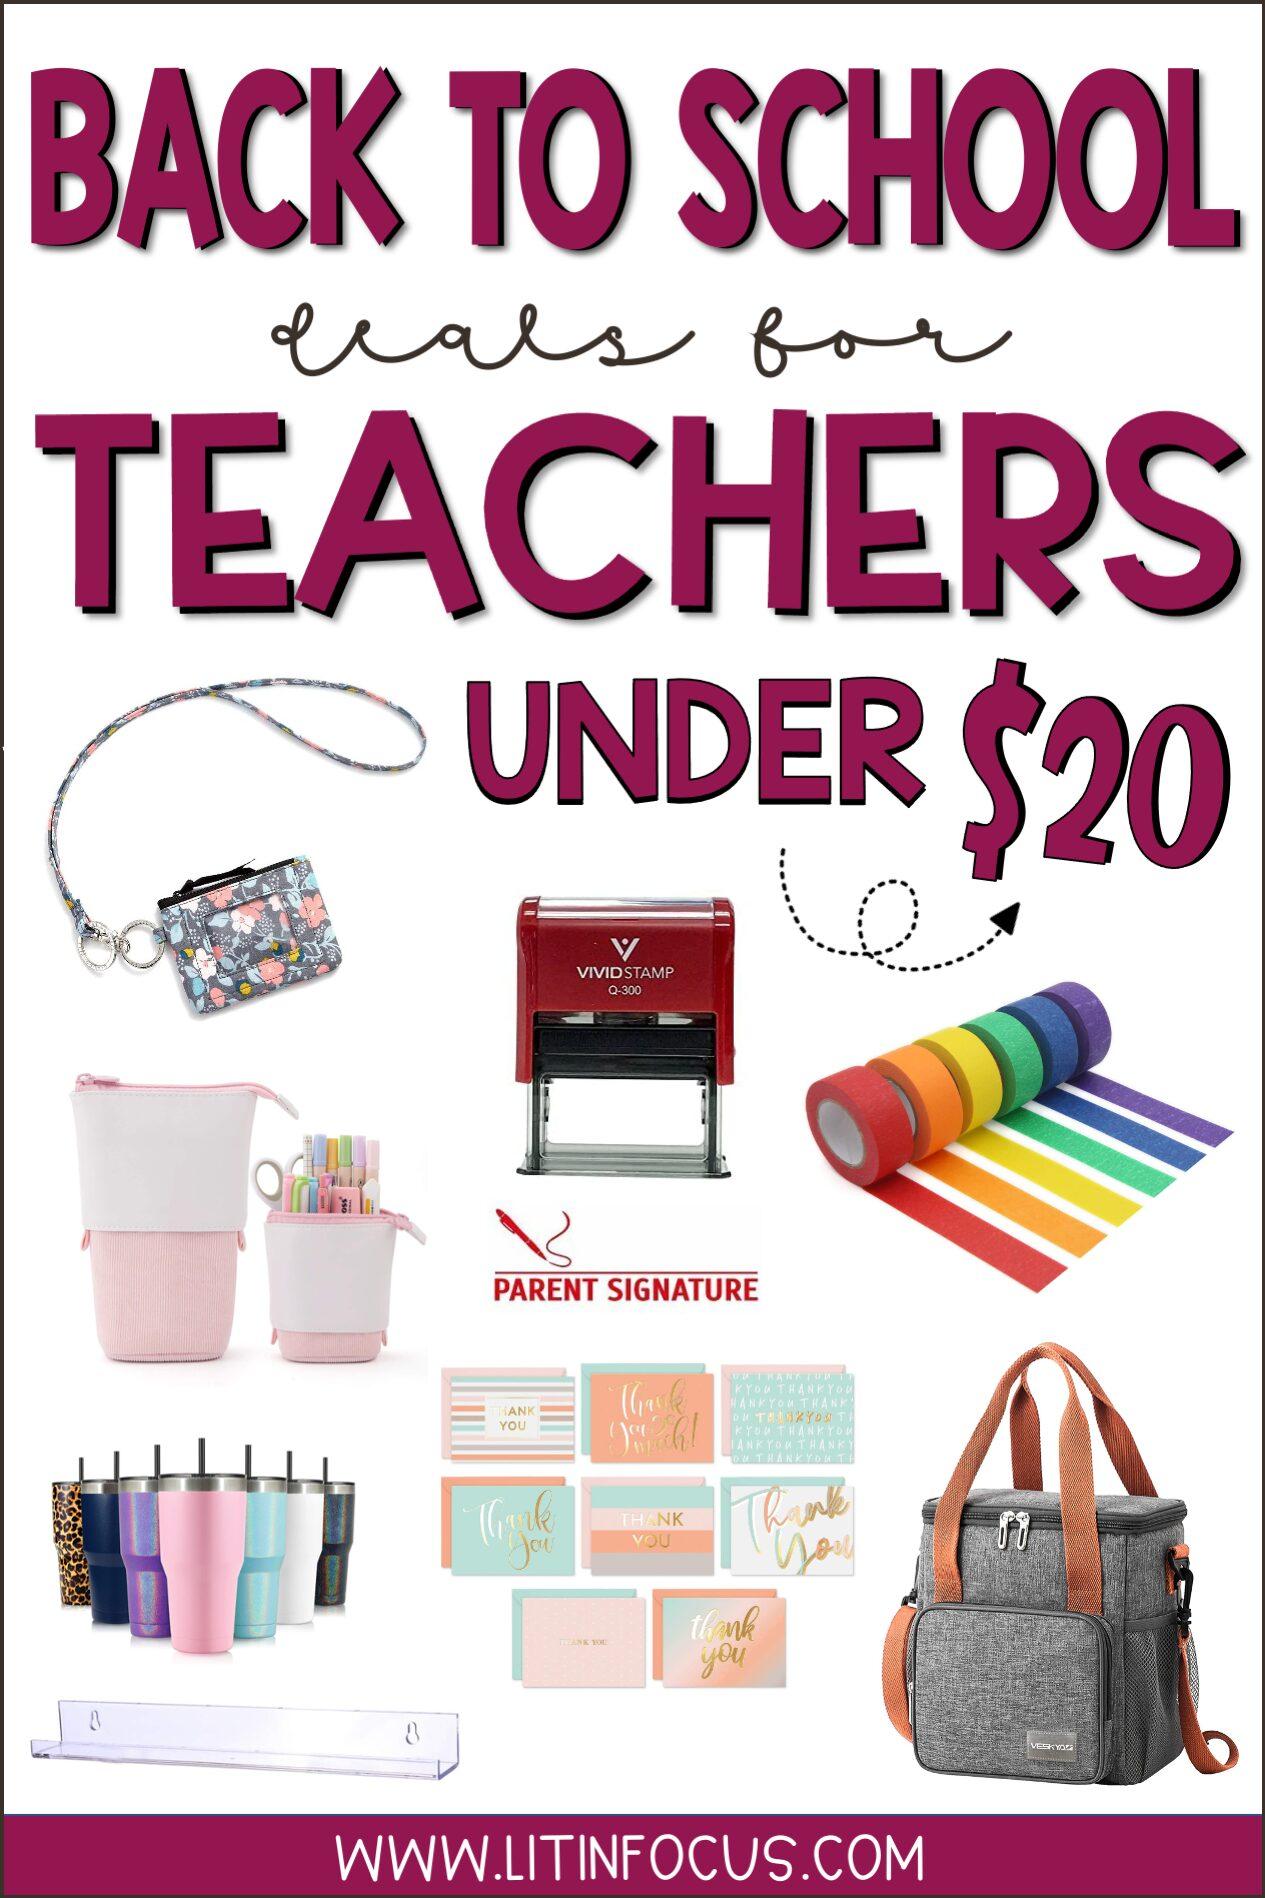 Back to School Teacher Deals